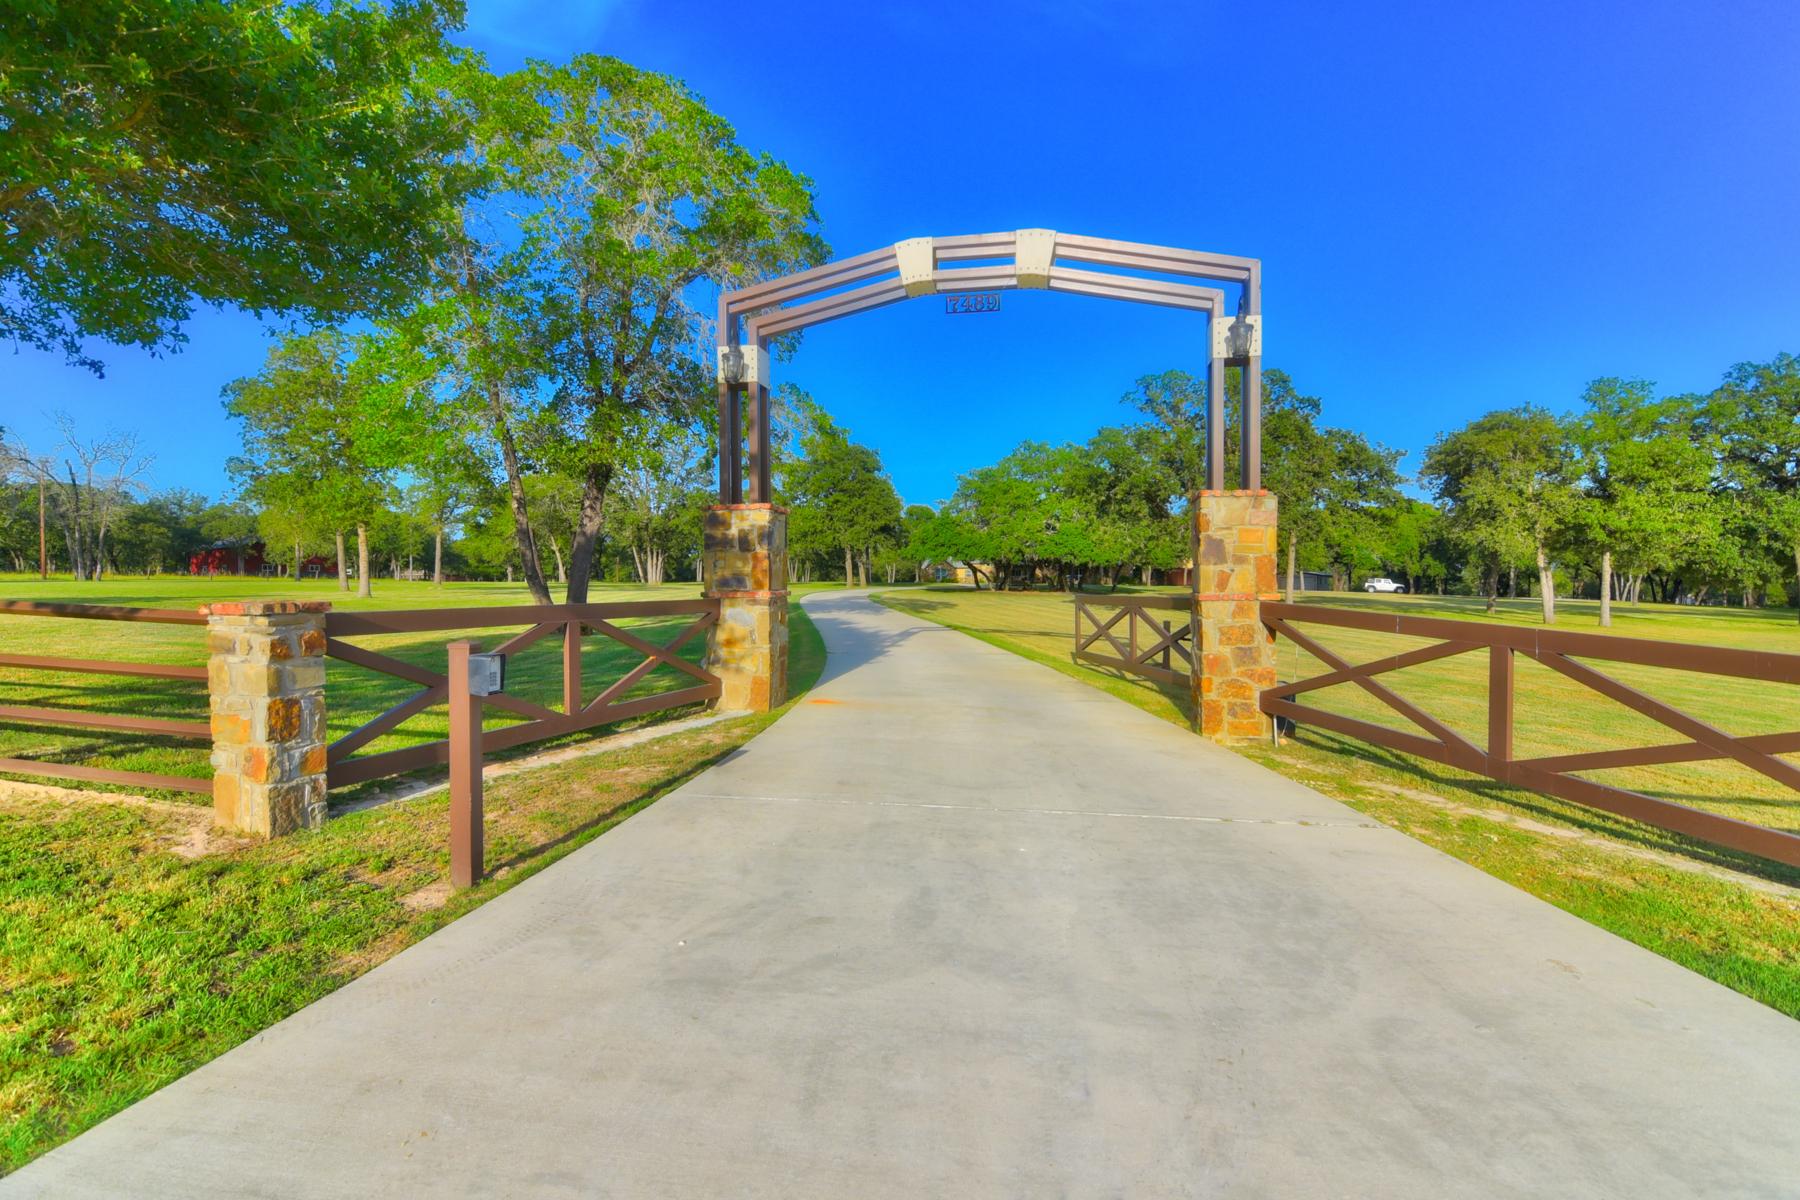 Single Family Home for Sale at Breathtaking La Vernia Gem 7489 FM 775 La Vernia, Texas 78121 United States